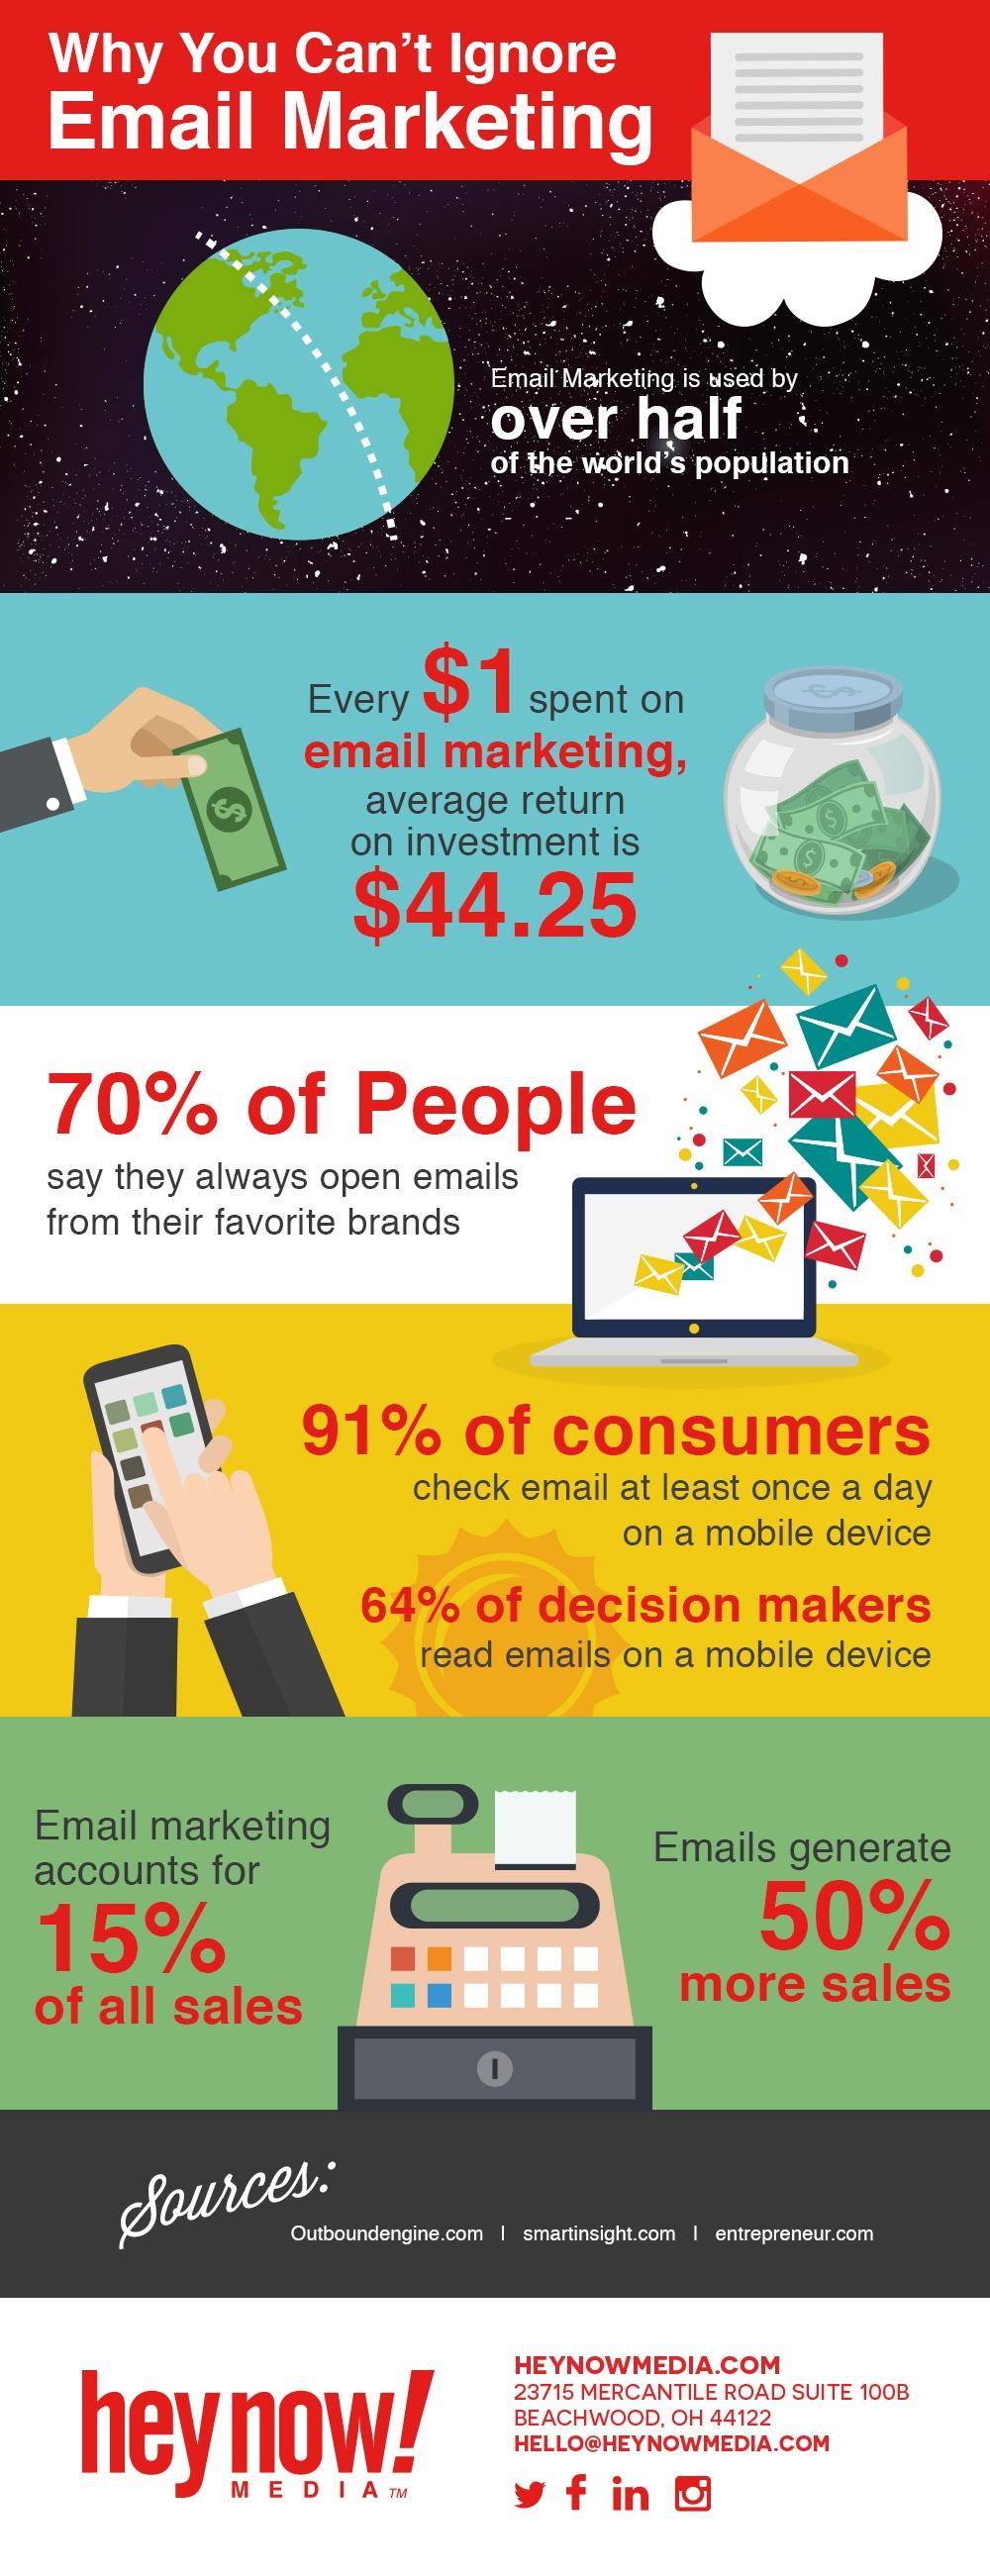 Email-Marketing-Infographic-1.jpg